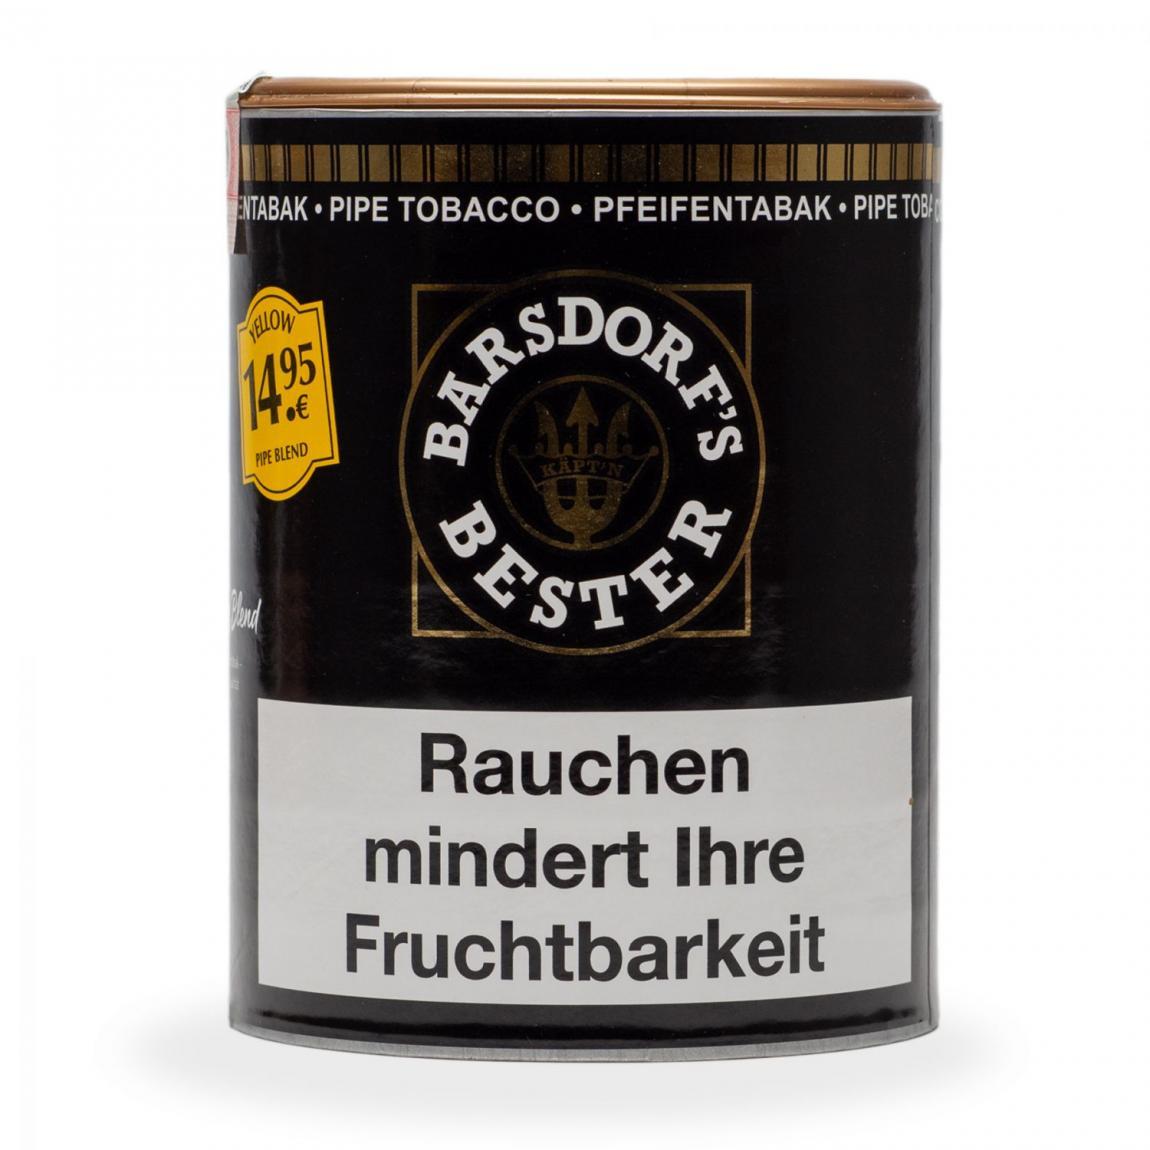 Barsdorf's Bester »Yellow Pipe Blend«